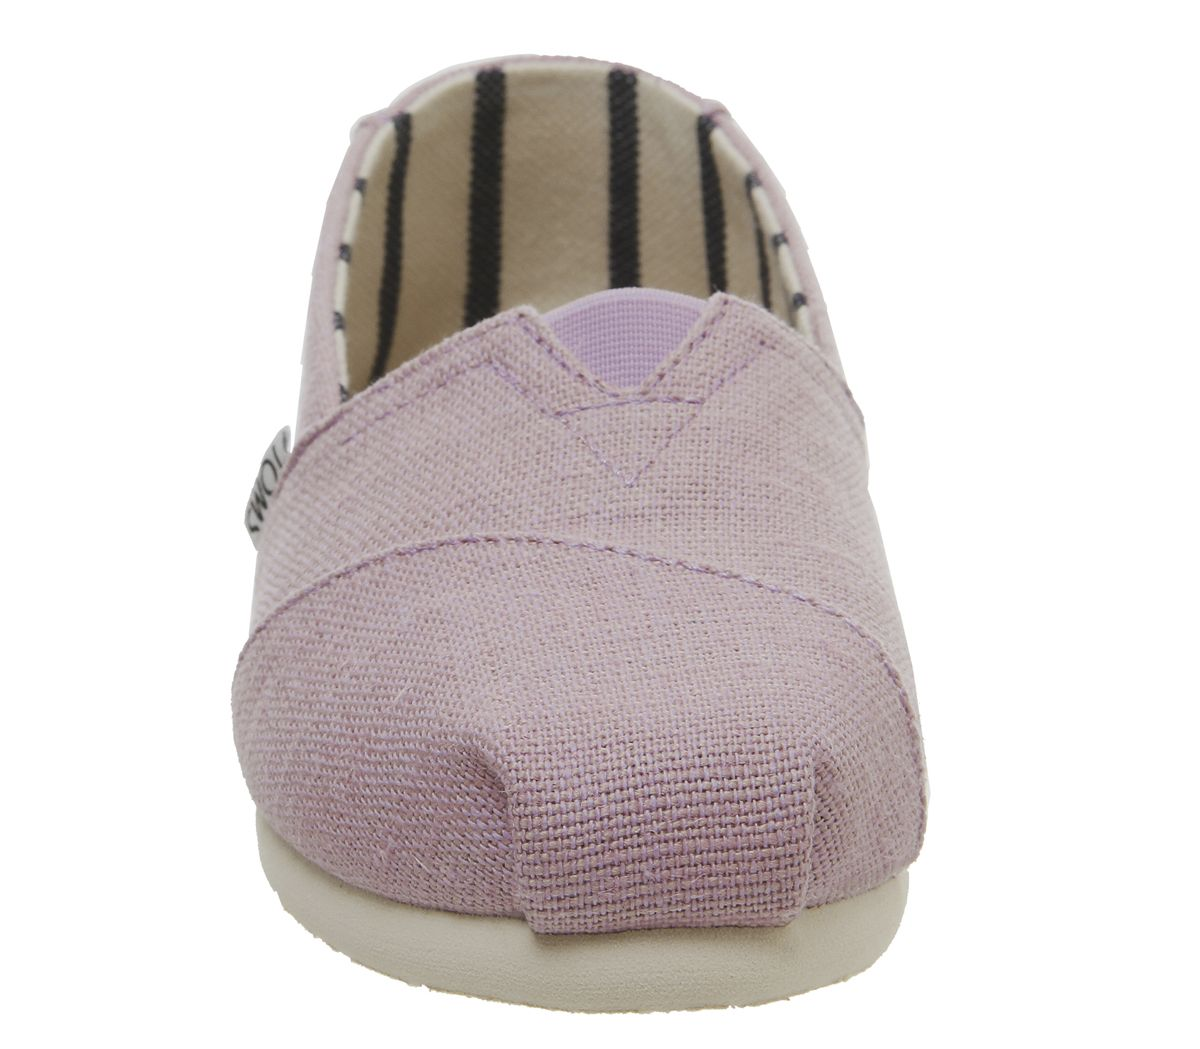 Womens-Toms-Seasonal-Classic-Slip-On-Flats-Soft-Lilac-Flats thumbnail 9